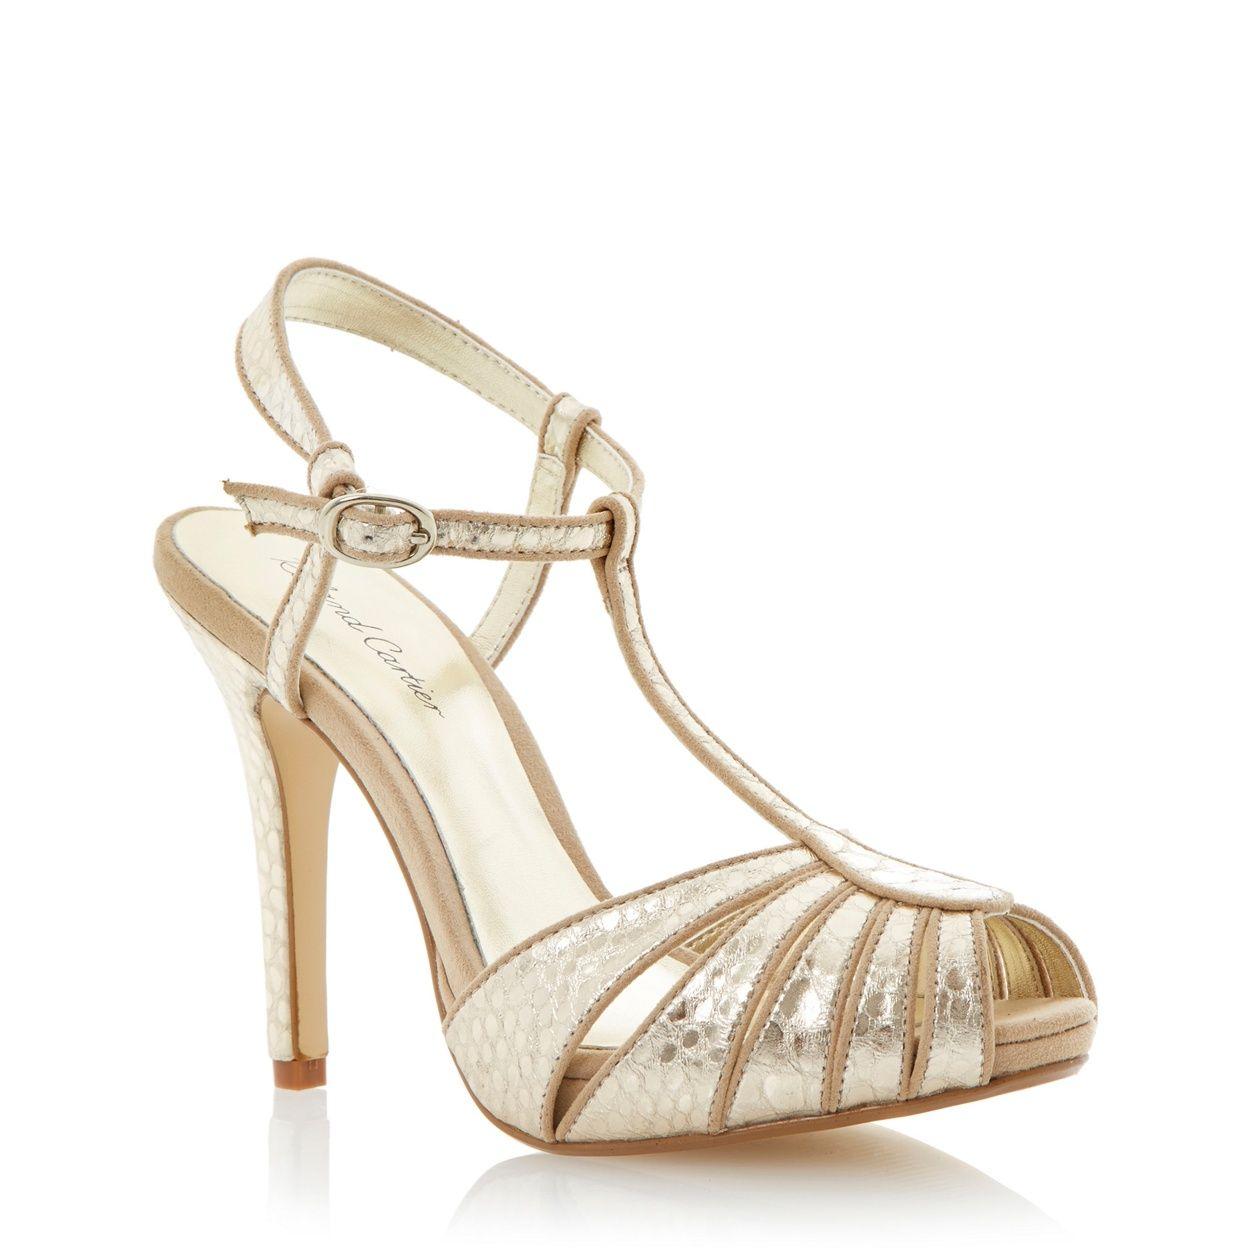 Gold t-bar platform sandal at debenhams